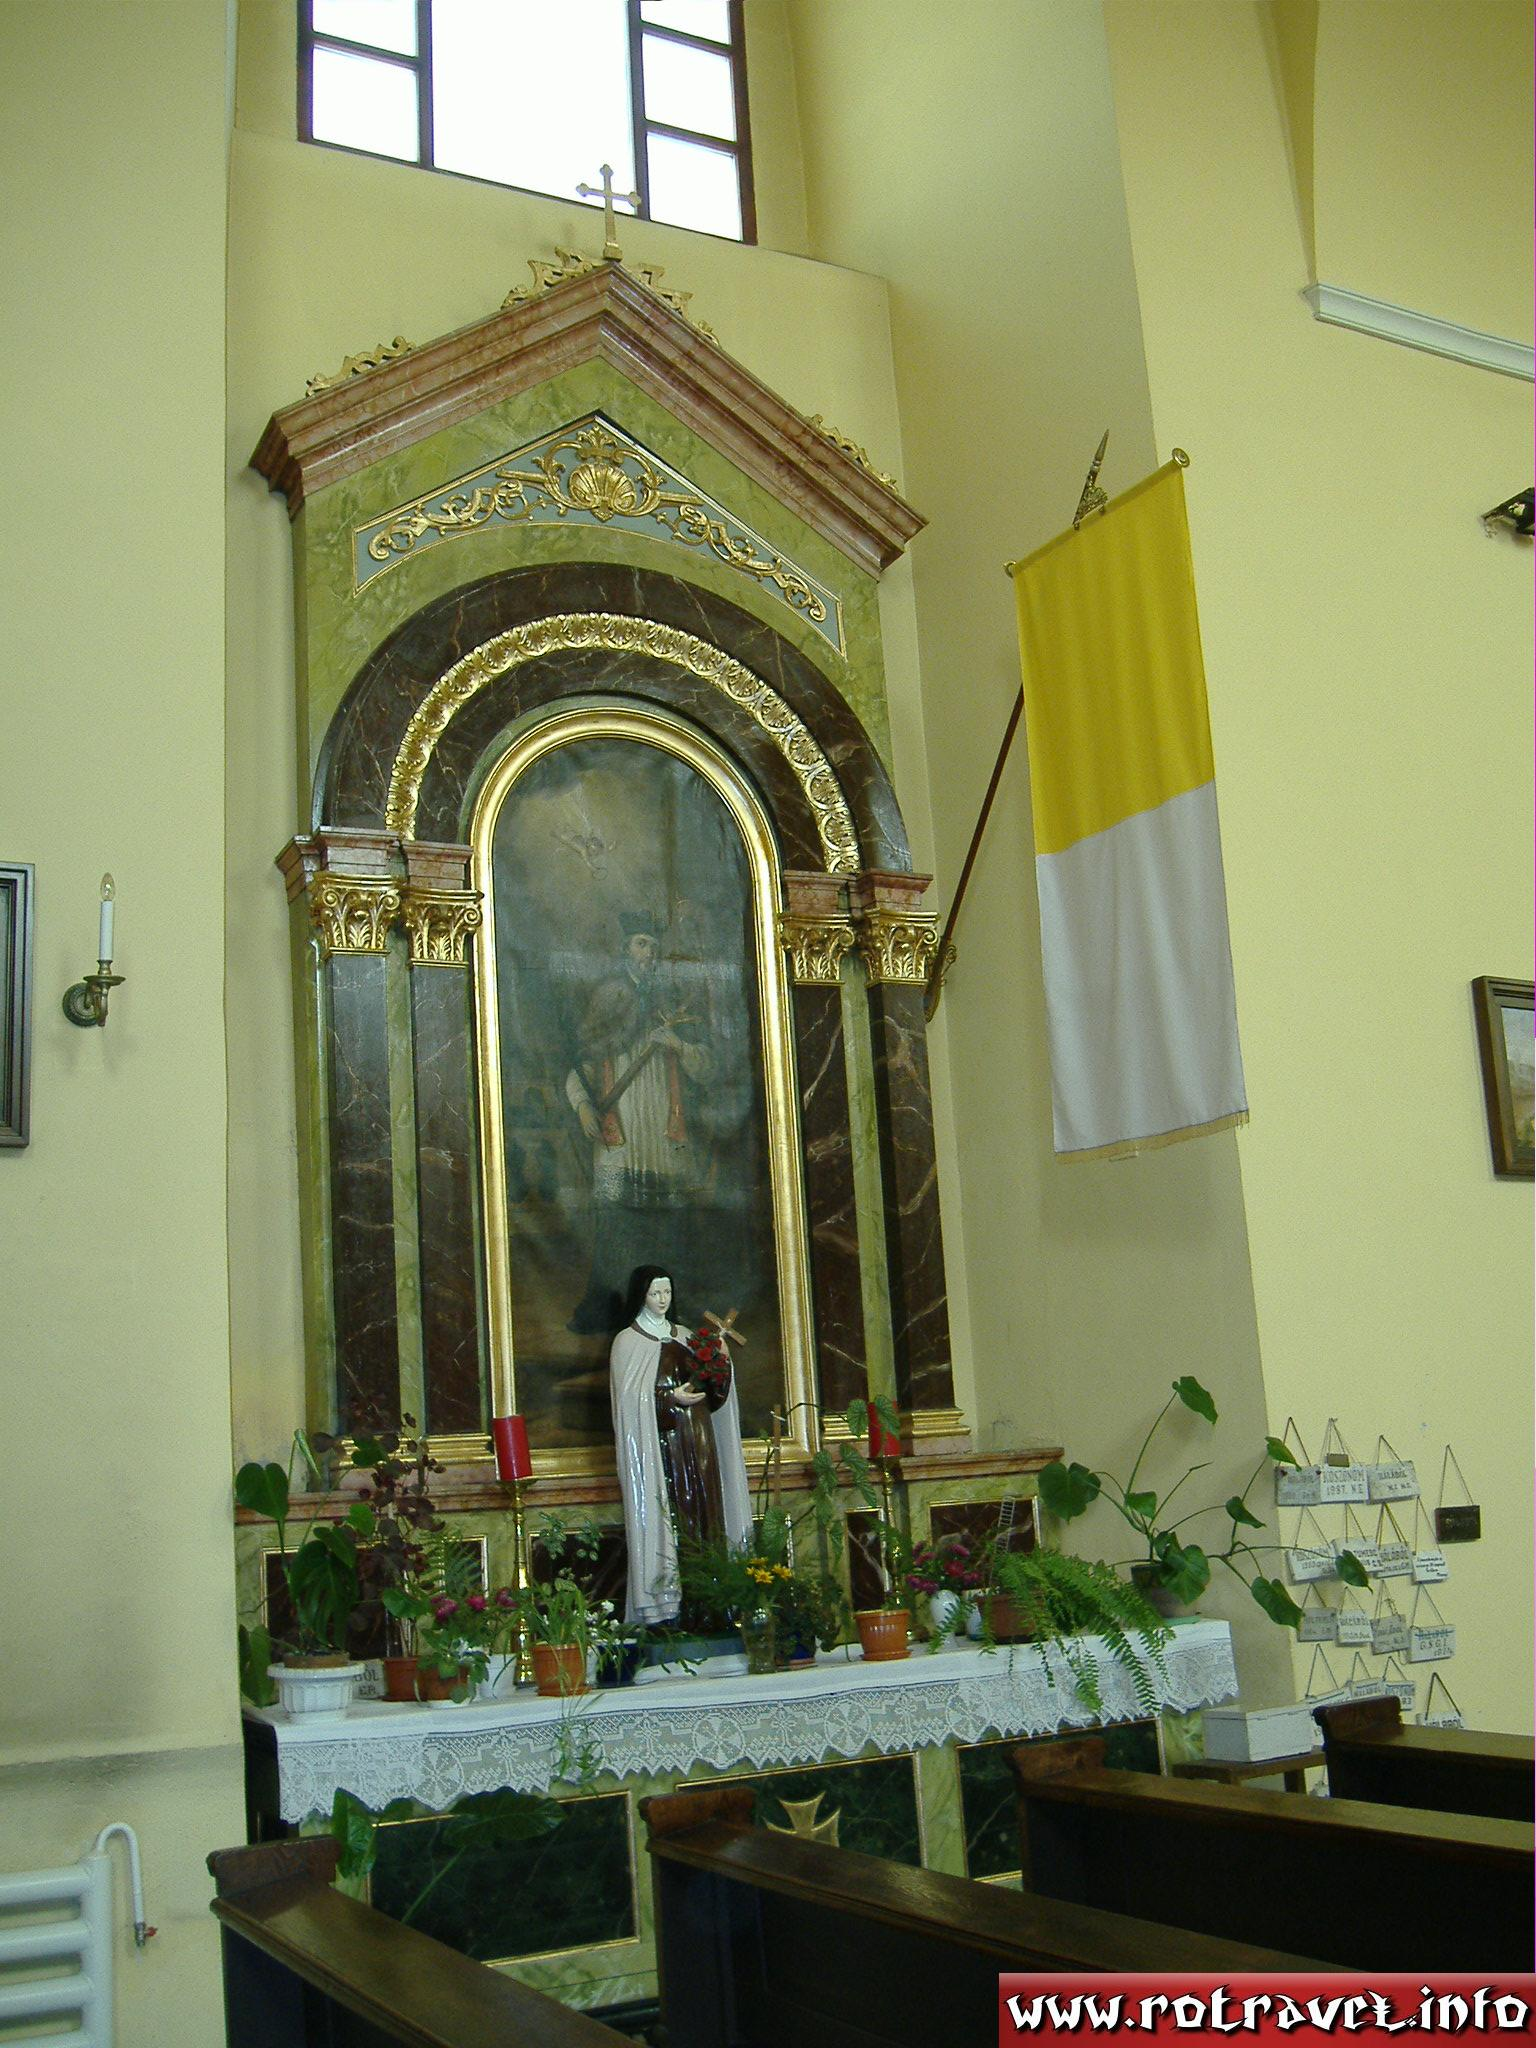 St. Ladislaus church (Catholic)